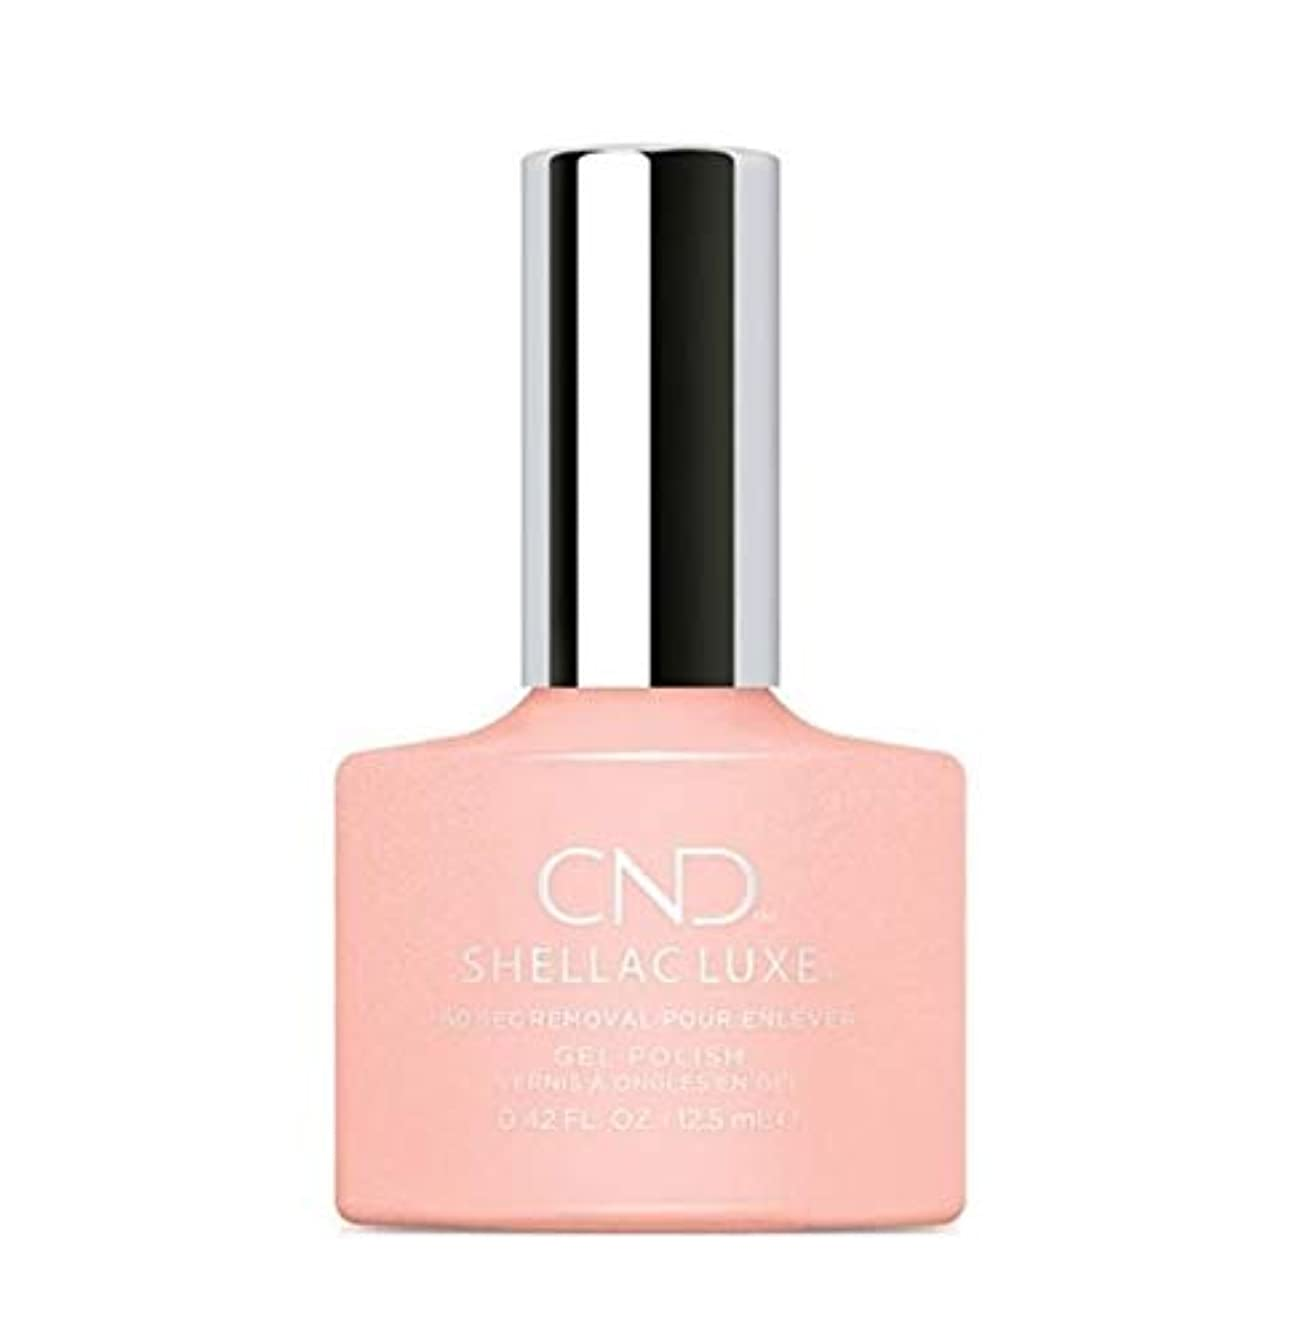 体細胞移植衣装CND Shellac Luxe - Grapefruit Sparkle - 12.5 ml / 0.42 oz